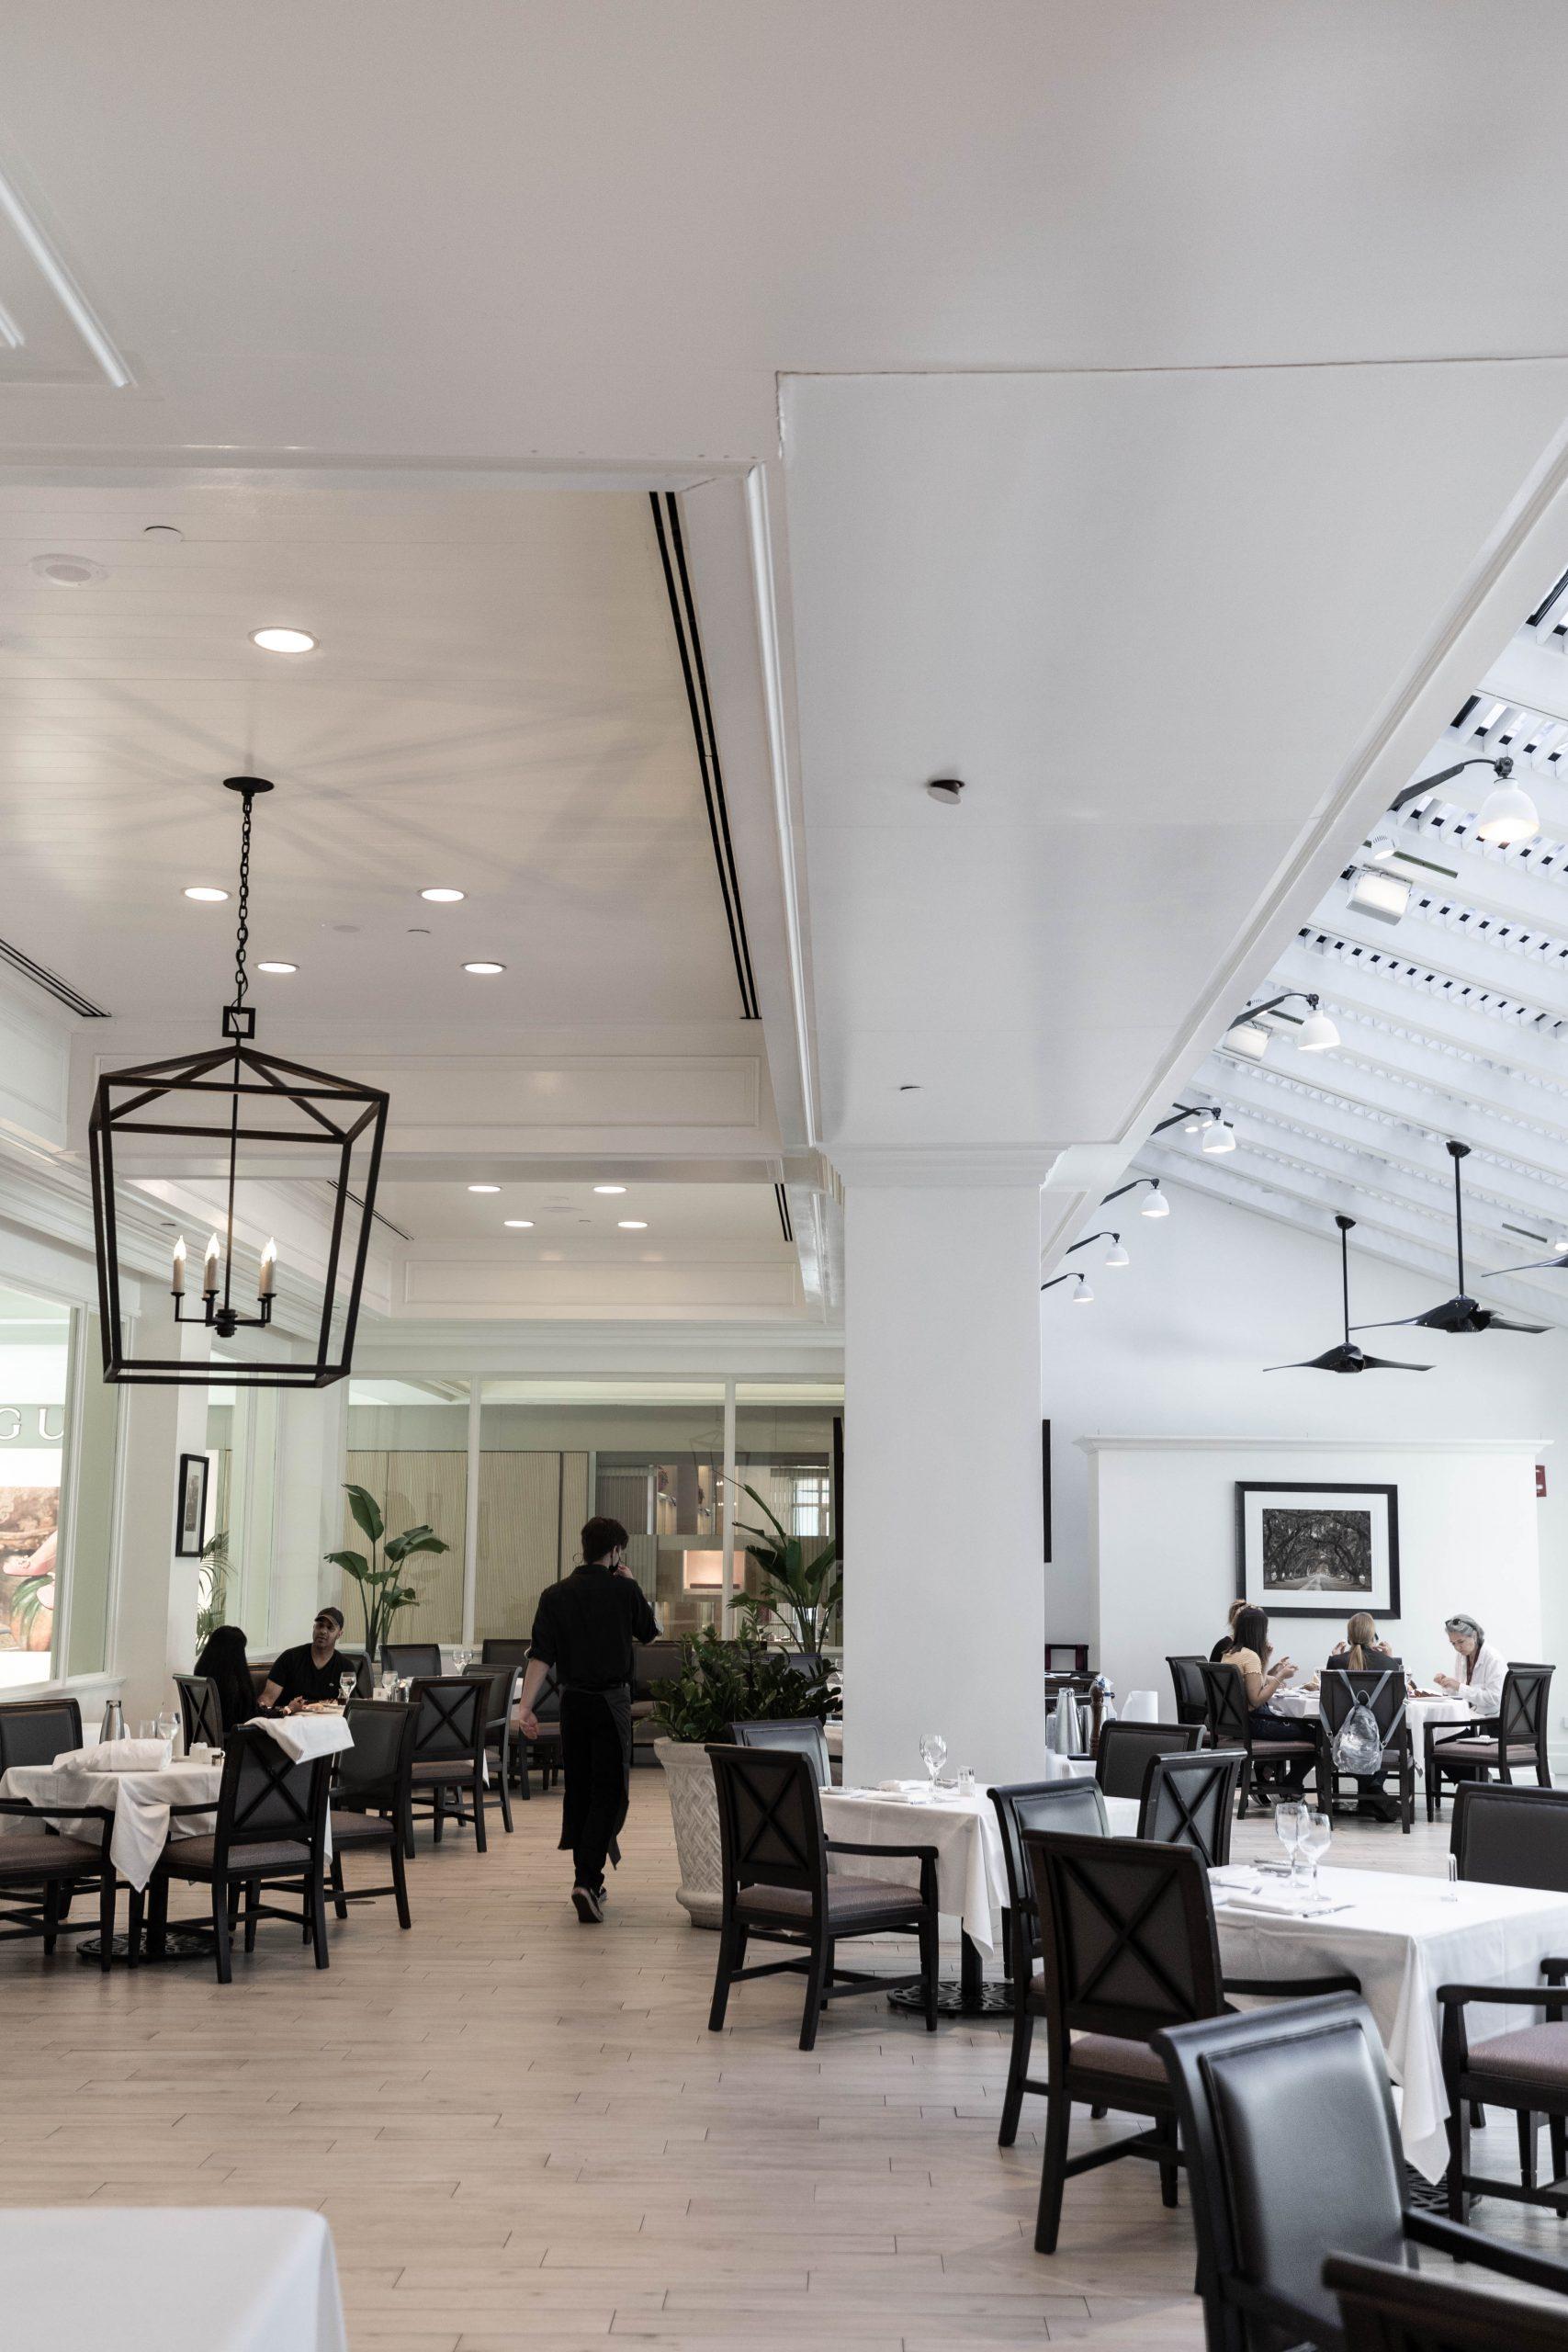 Palmetto Café Inside Belmond Charleston Place Luxury Hotel Written & Photographed by Annie Fairfax